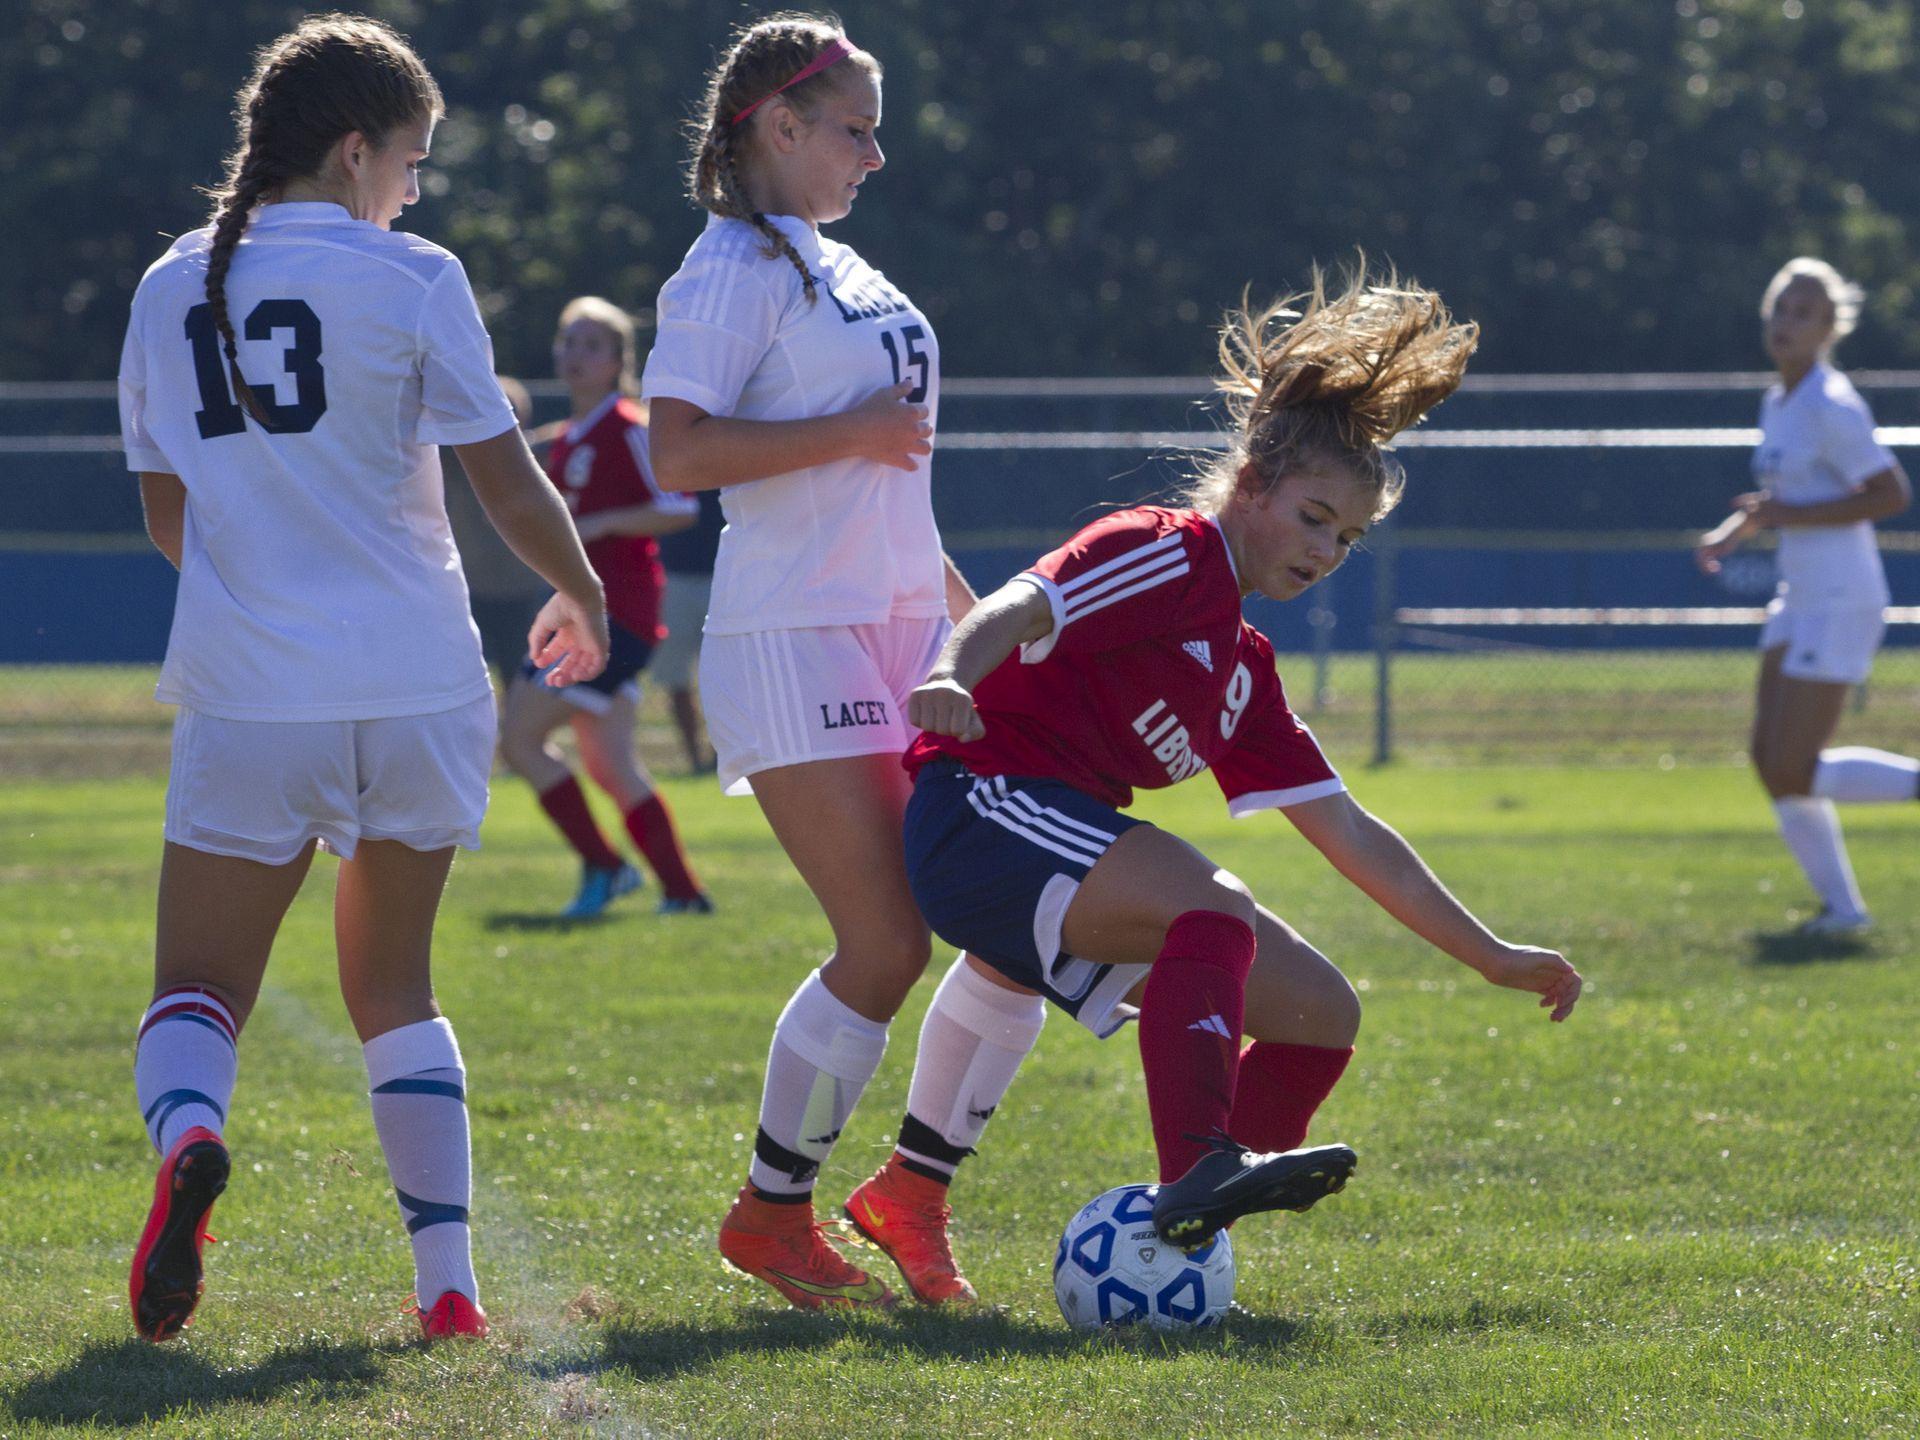 Girls Soccer: Lacey vs Jackson Liberty